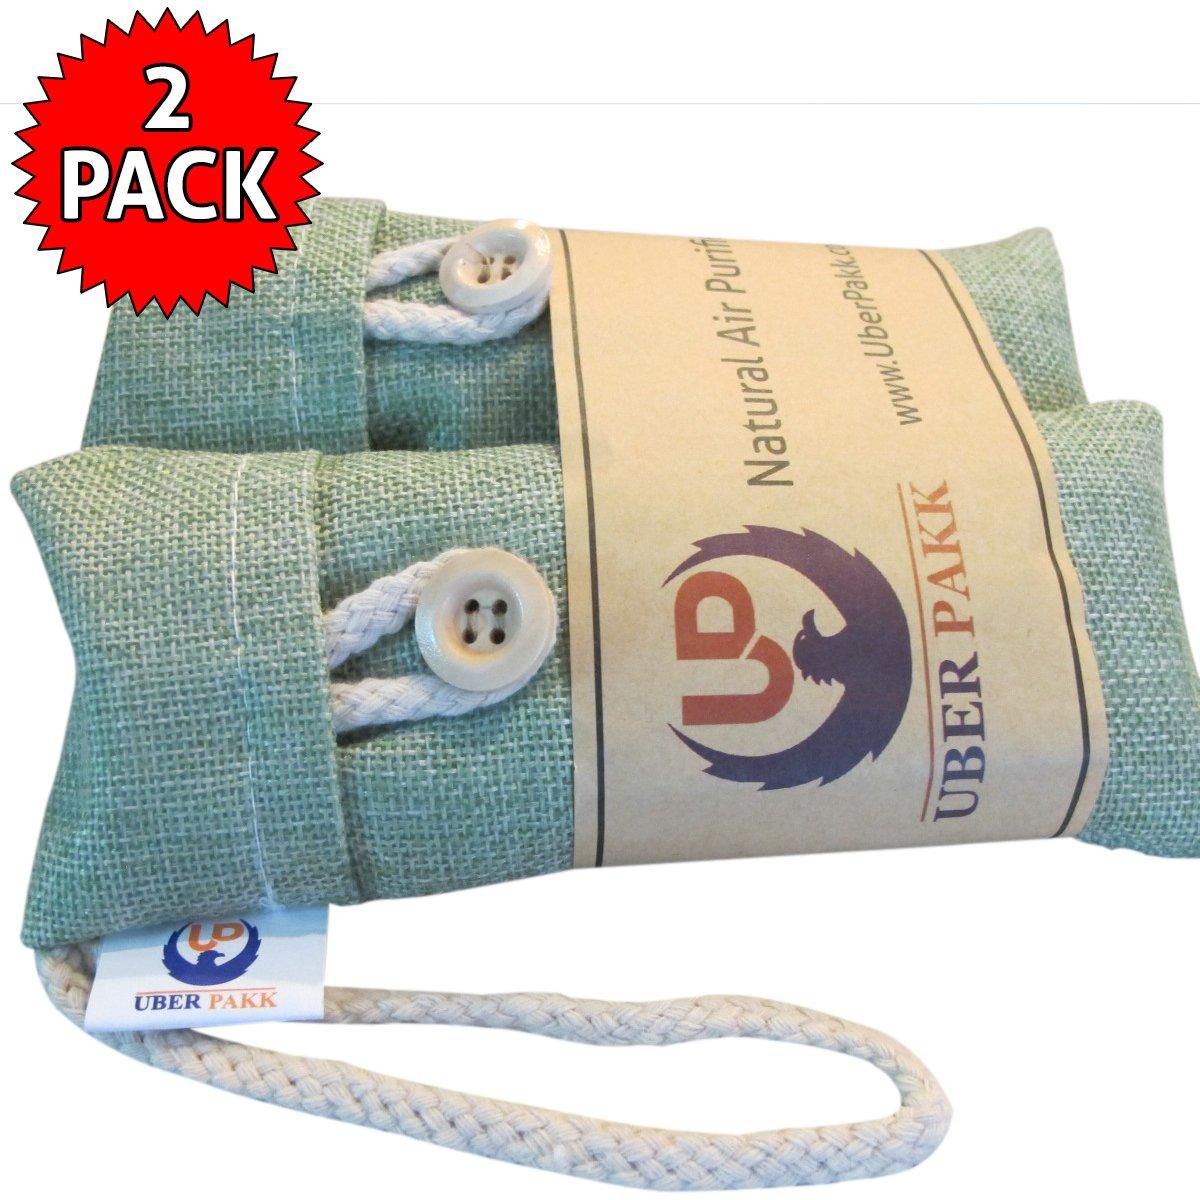 Odor Absorber Activated Charcoal Natural Deodorizer Bag Fragrance Free Deodo Ebay